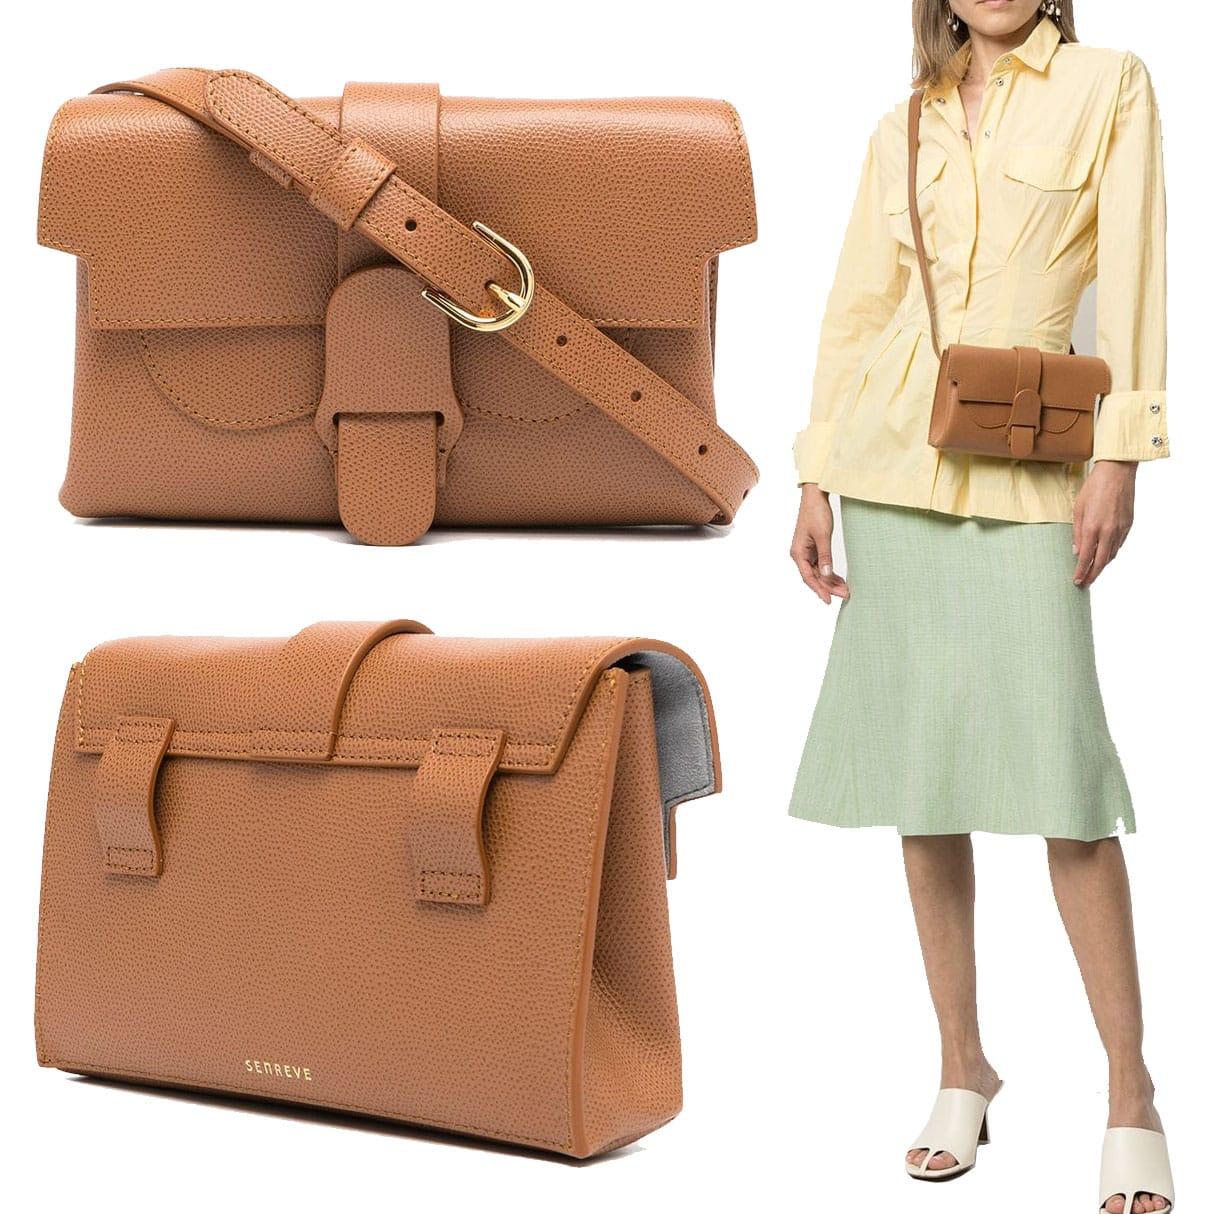 Senreve's Aria belt bag has a minimalist, classic look, featuring an adjustable waist strap and a detachable shoulder strap